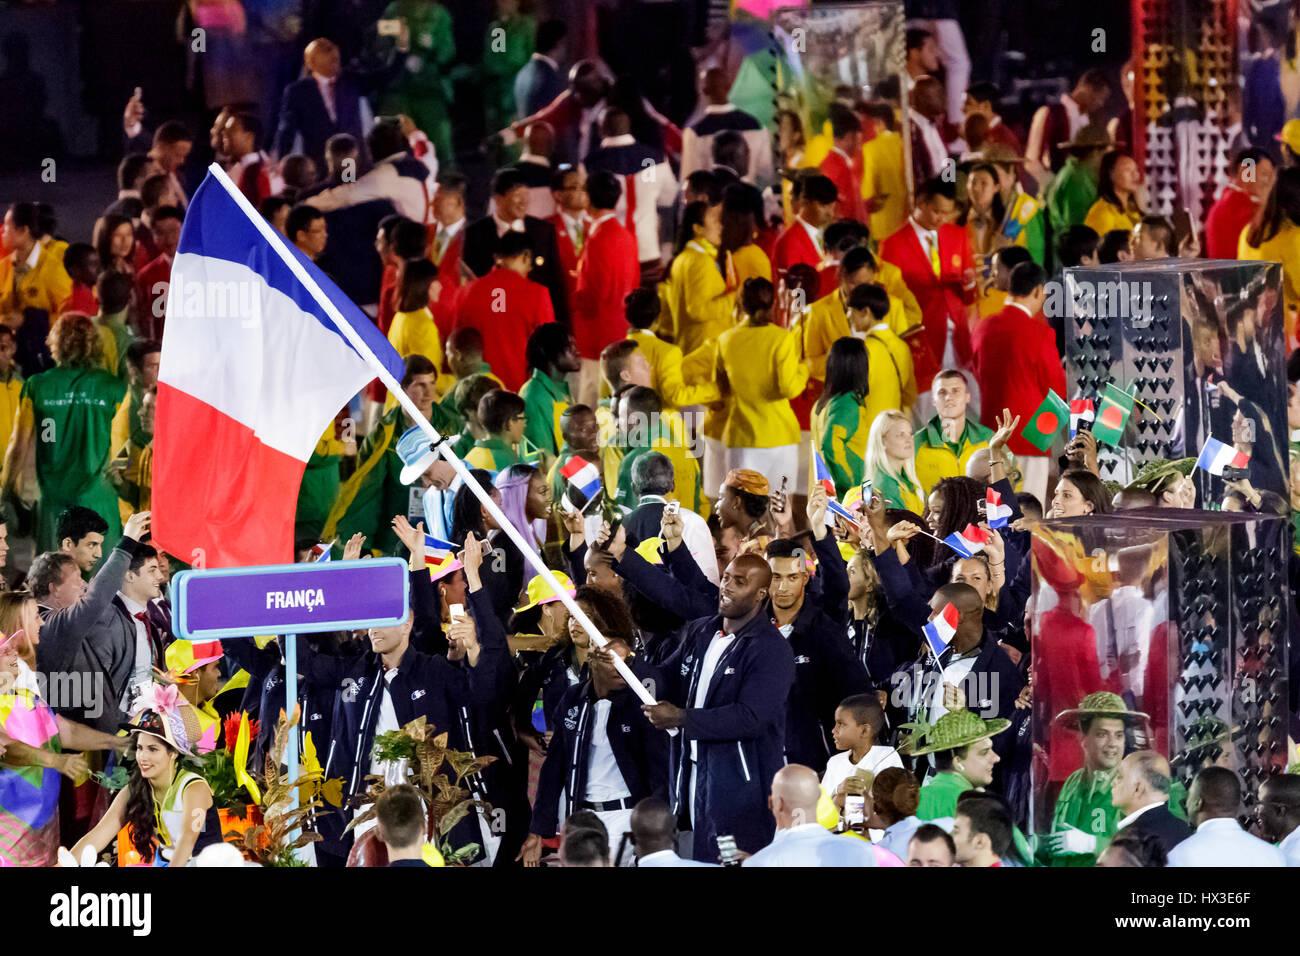 Rio de Janeiro, Brazil. 5 August 2016 Teddy Riner FRA flag bearer at the Olympic Summer Games Opening Ceremonies. - Stock Image